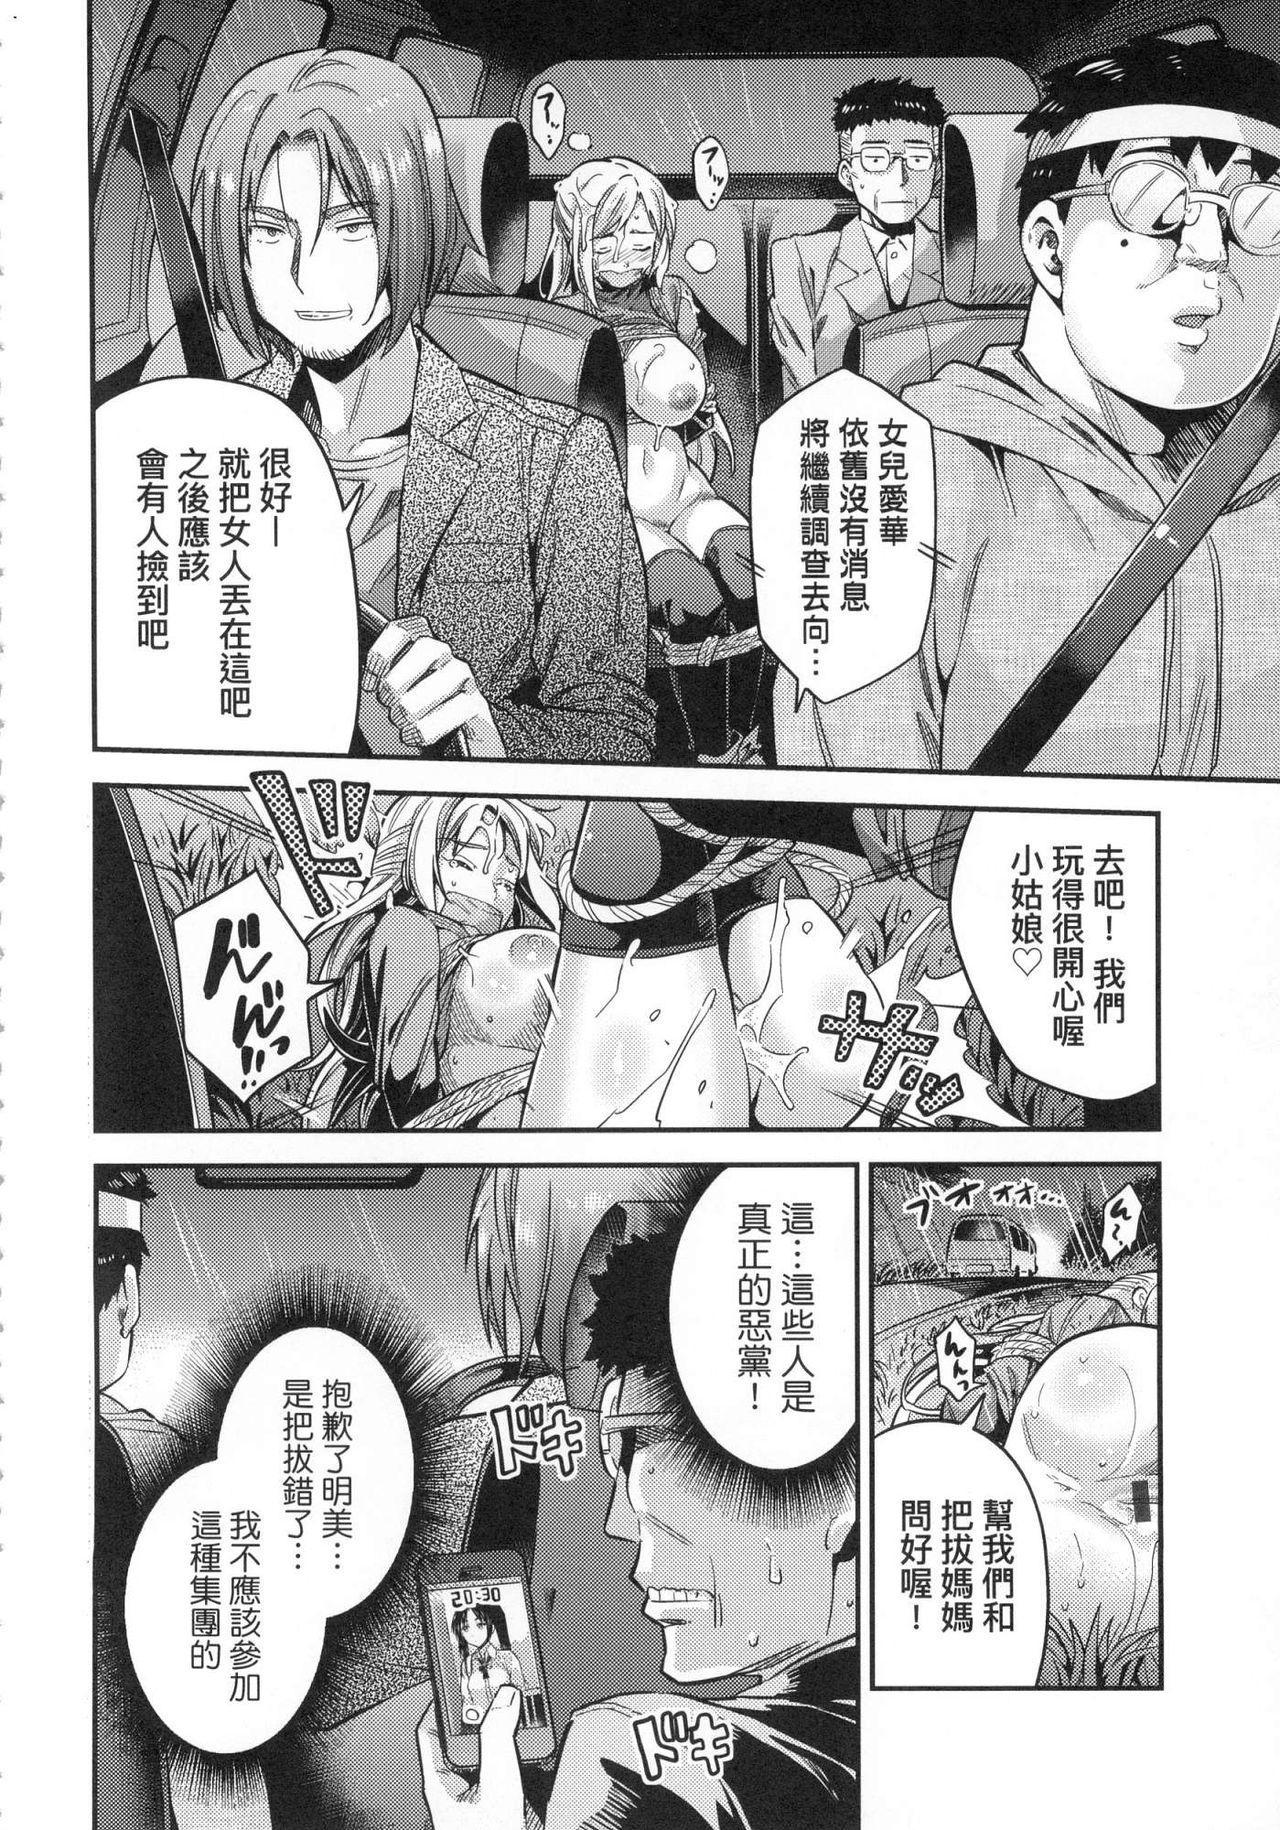 Kyousei Tanetsuke Express - Forced Seeding Express 69